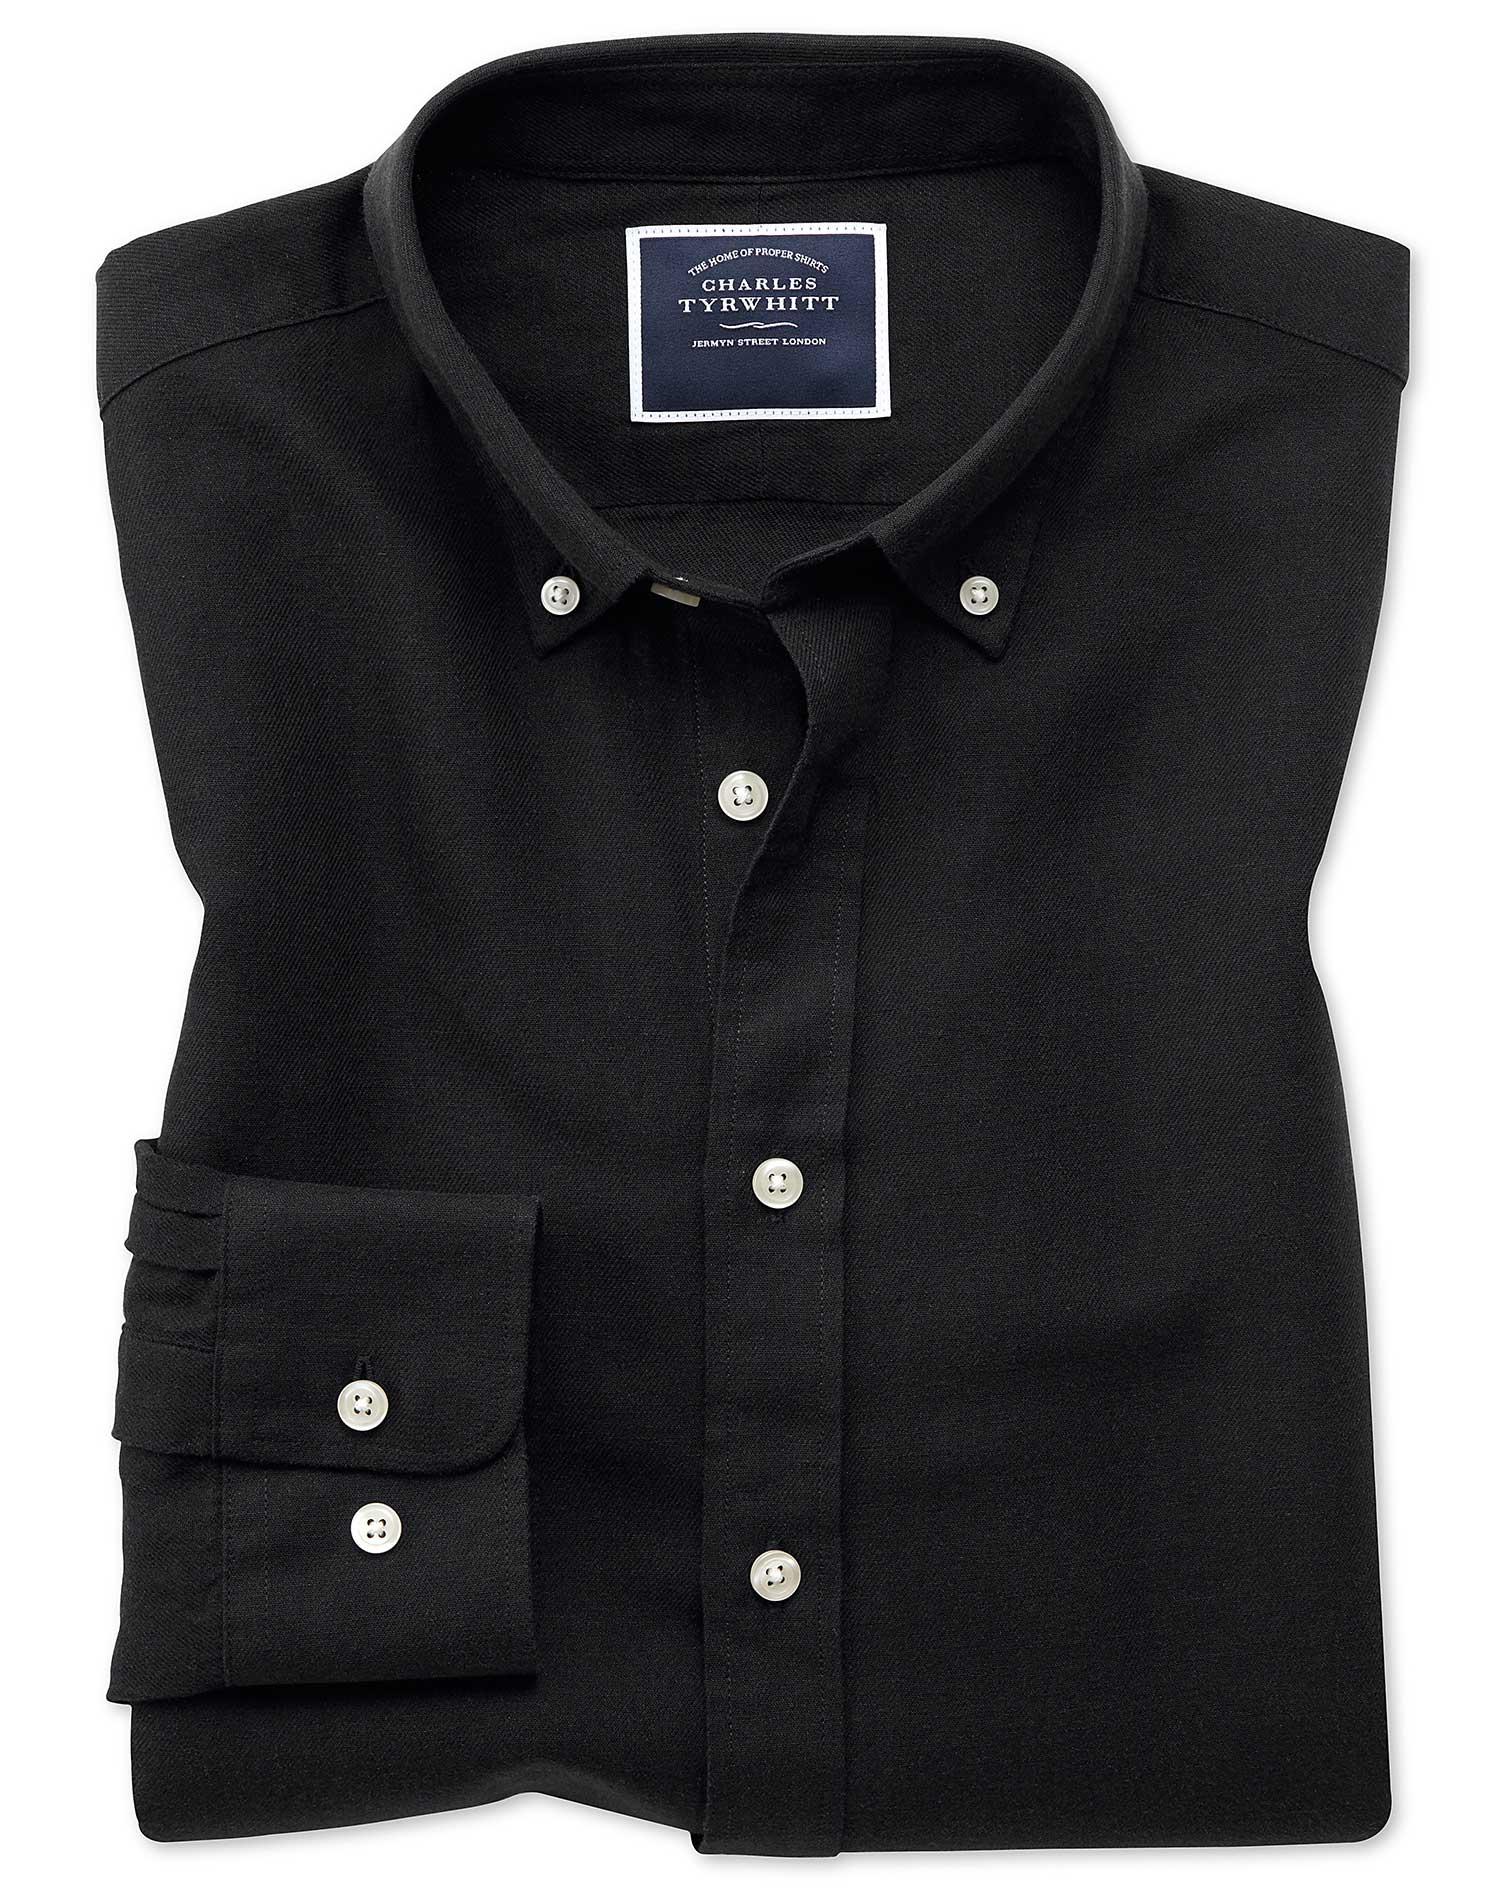 Classic Fit Black Cotton Linen Twill Shirt Single Cuff Size Medium by Charles Tyrwhitt